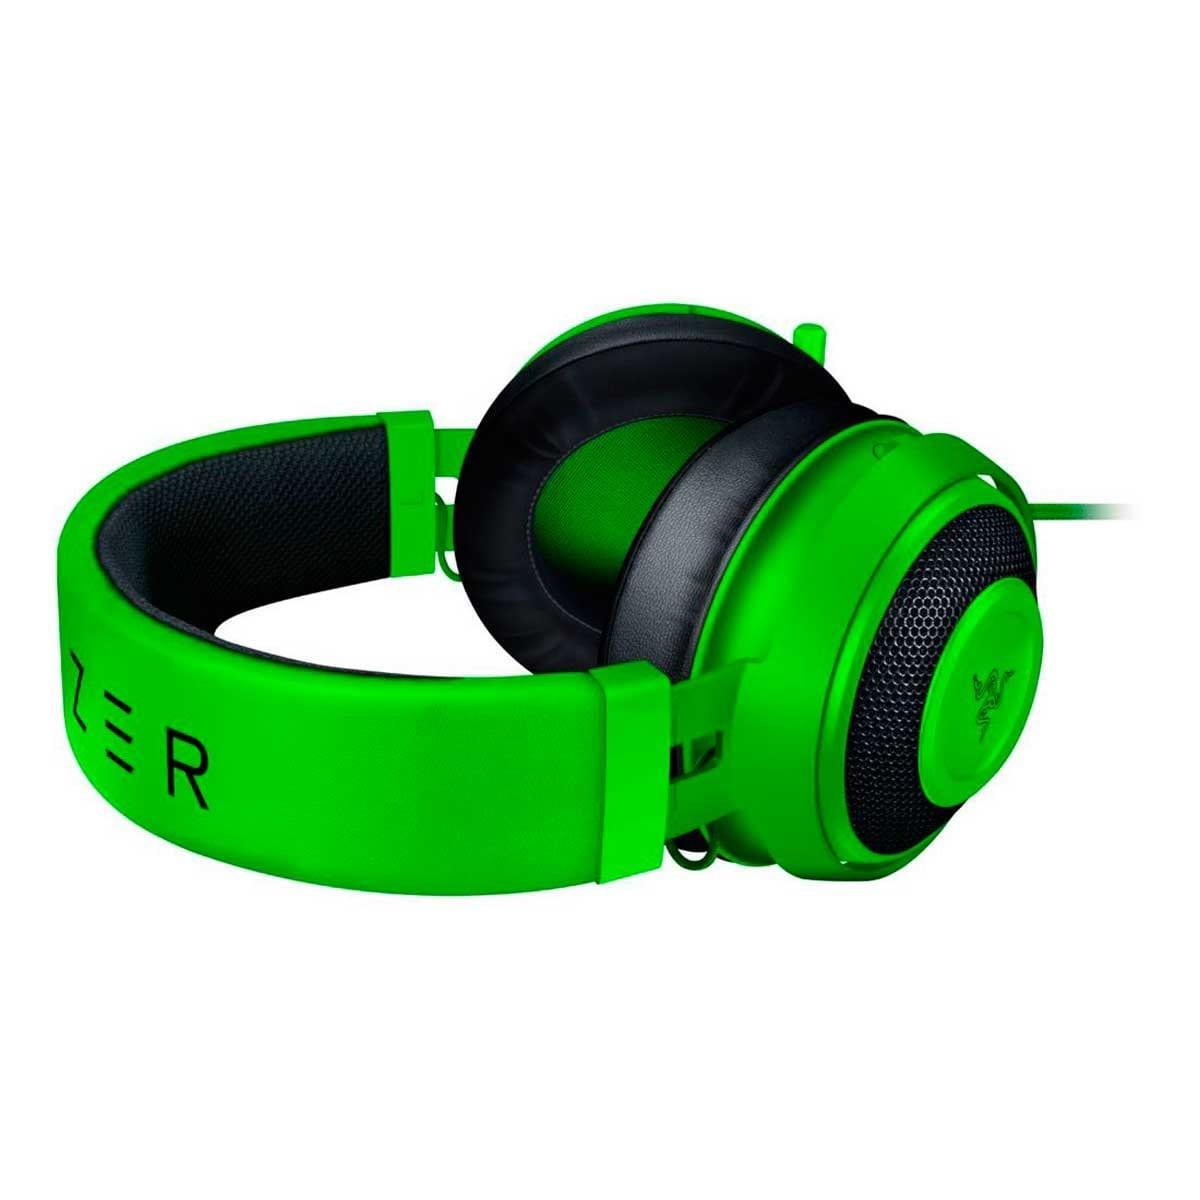 Auriculares Universal Kraken Green Razer